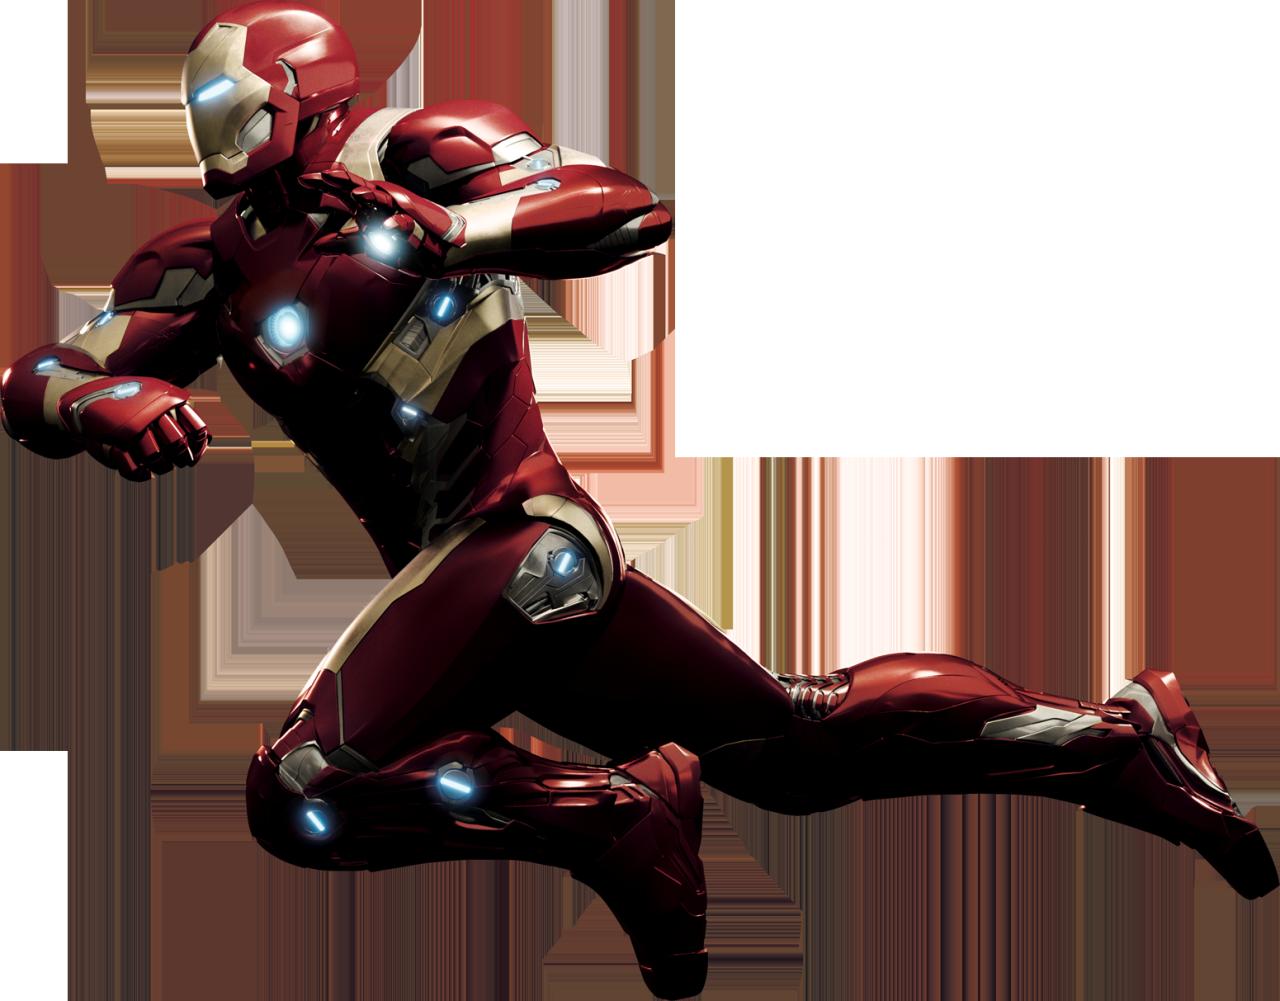 Http I Imgbox Com Iokswwld Png Captain America Civil War Tv Spot Iron Man